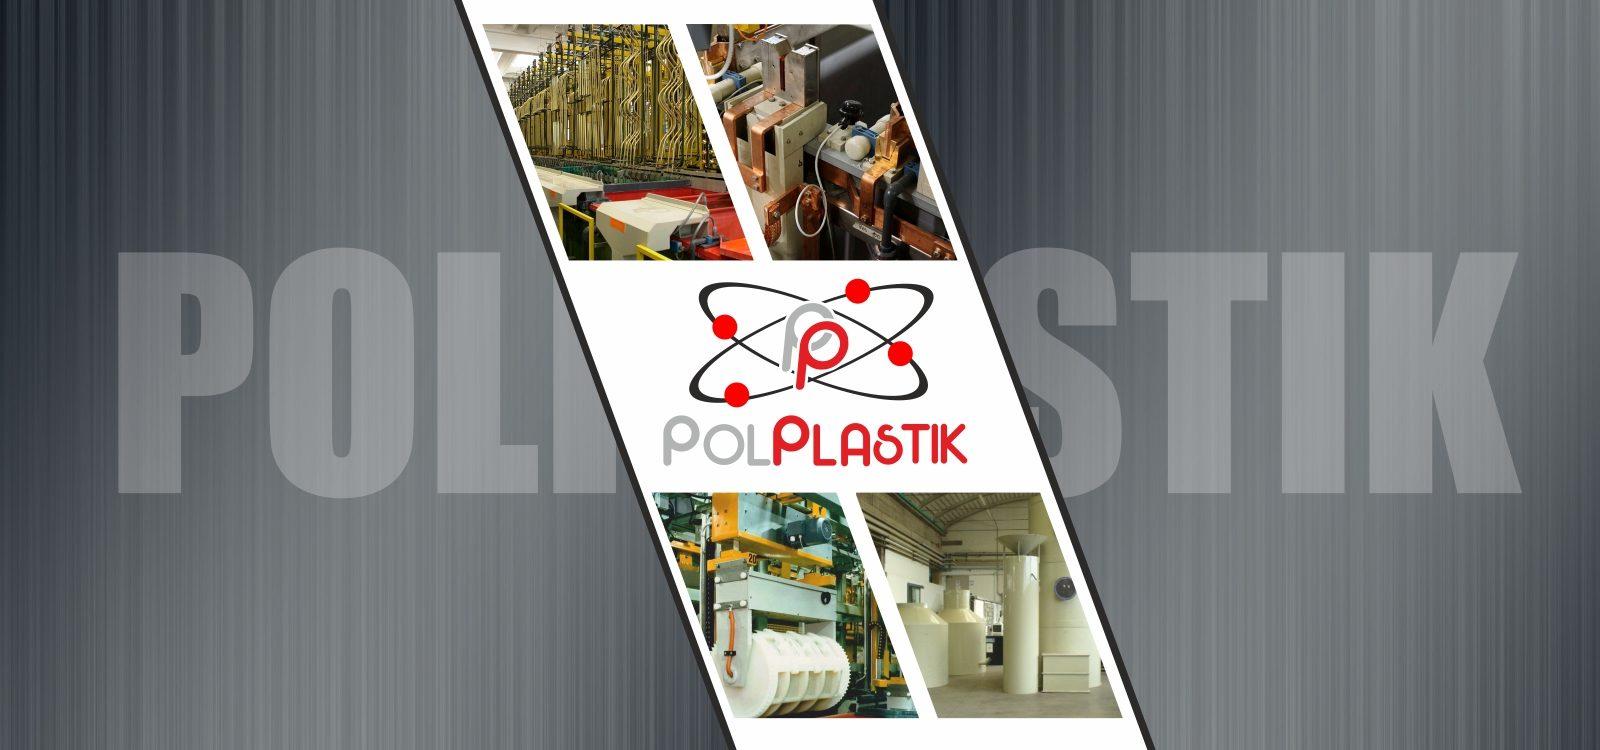 Polplastik